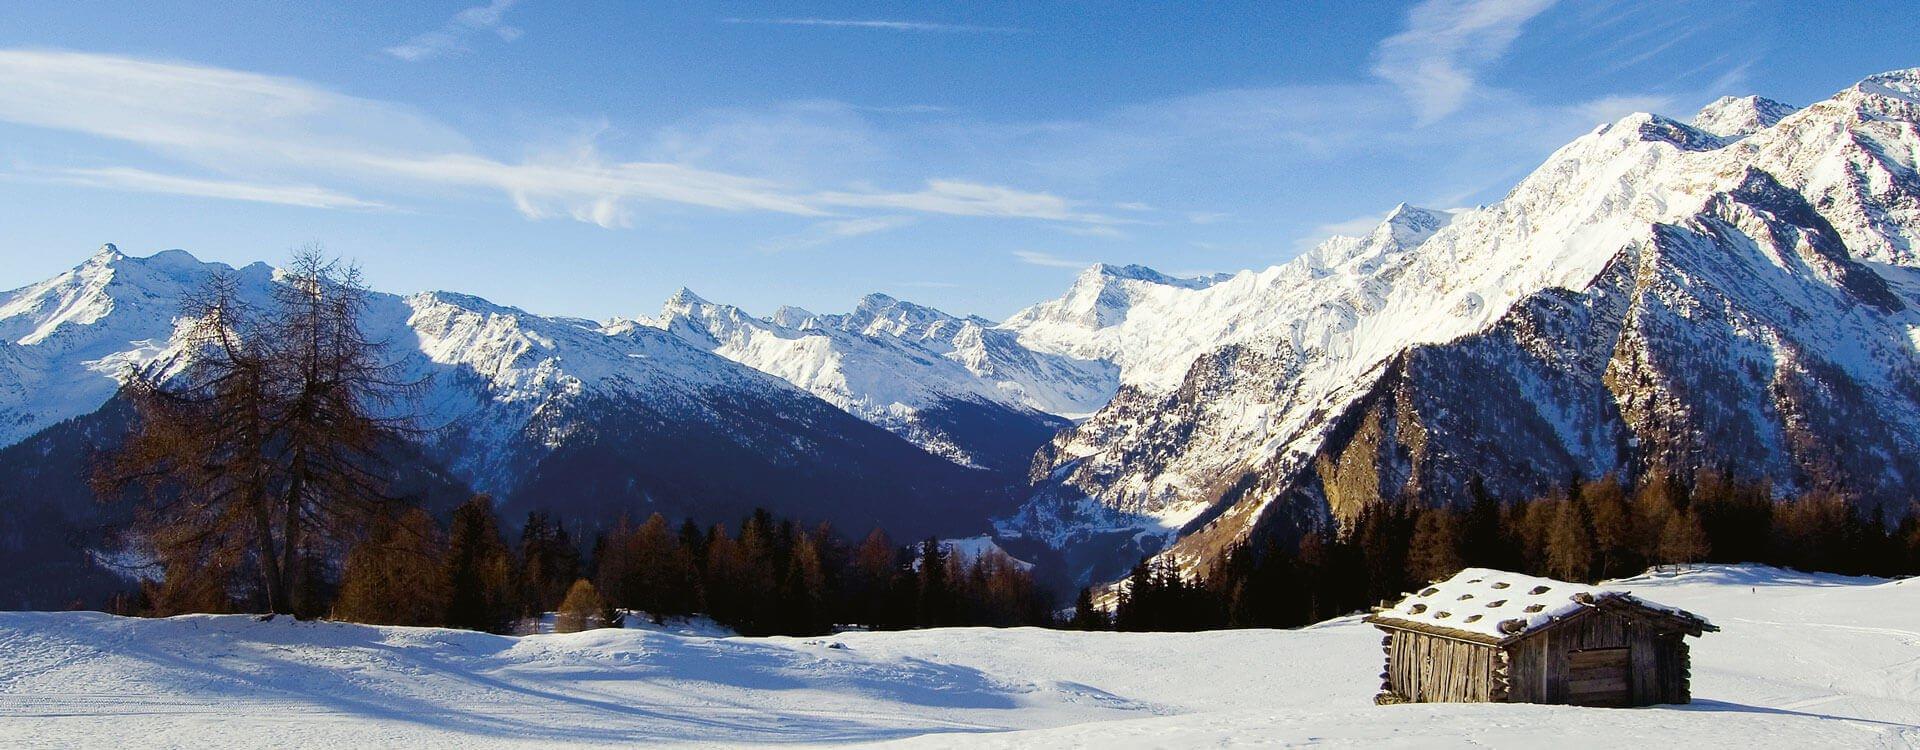 winterurlaub-passeiertal-suedtirol-2